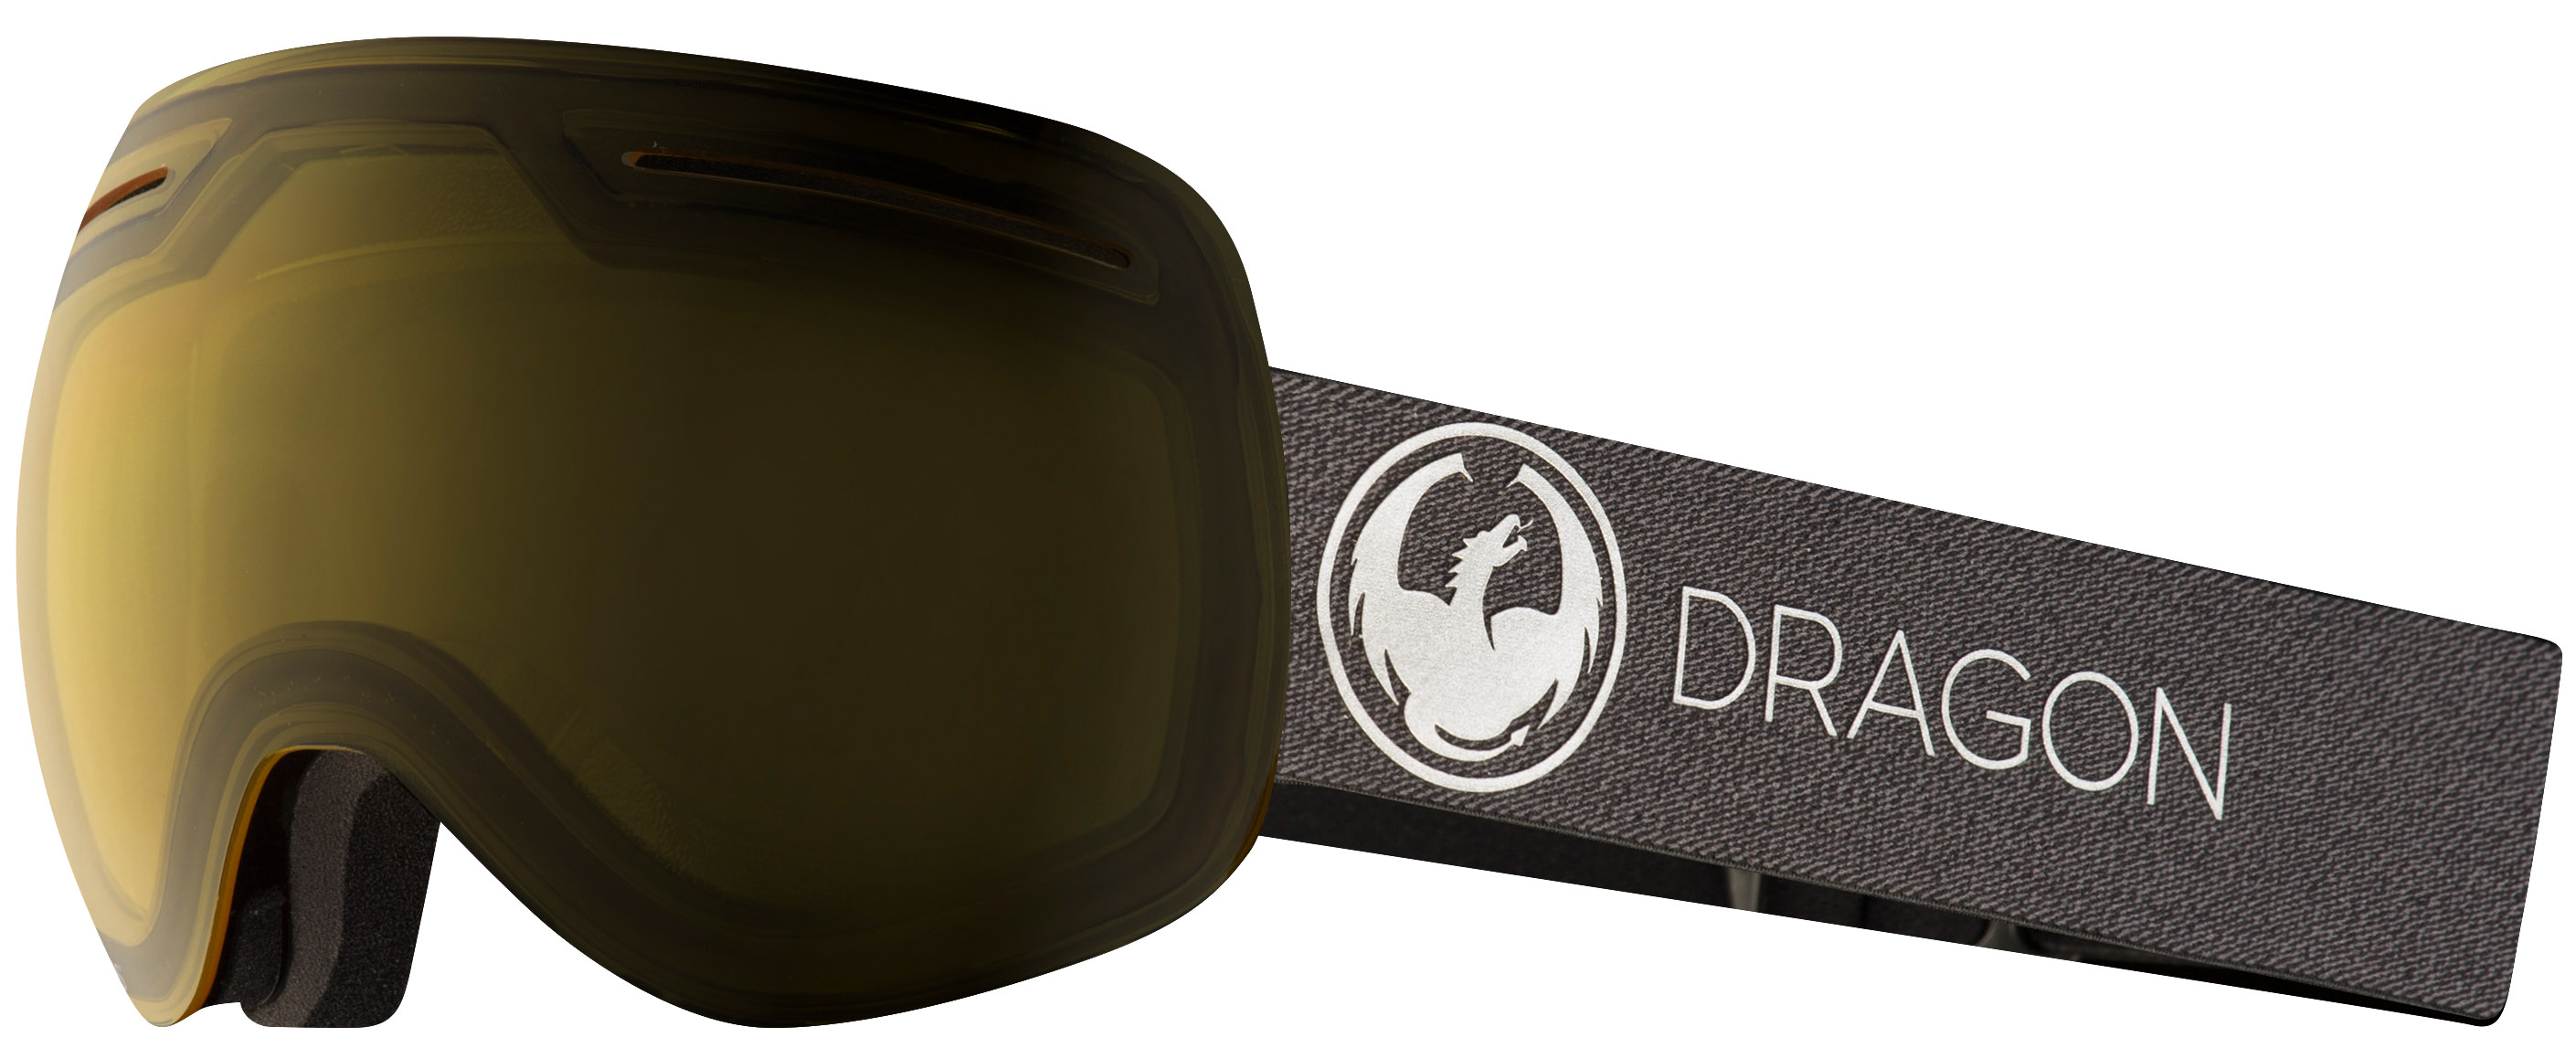 51d969bec38 Dragon X1 Transitions Lens Goggles - Unisex